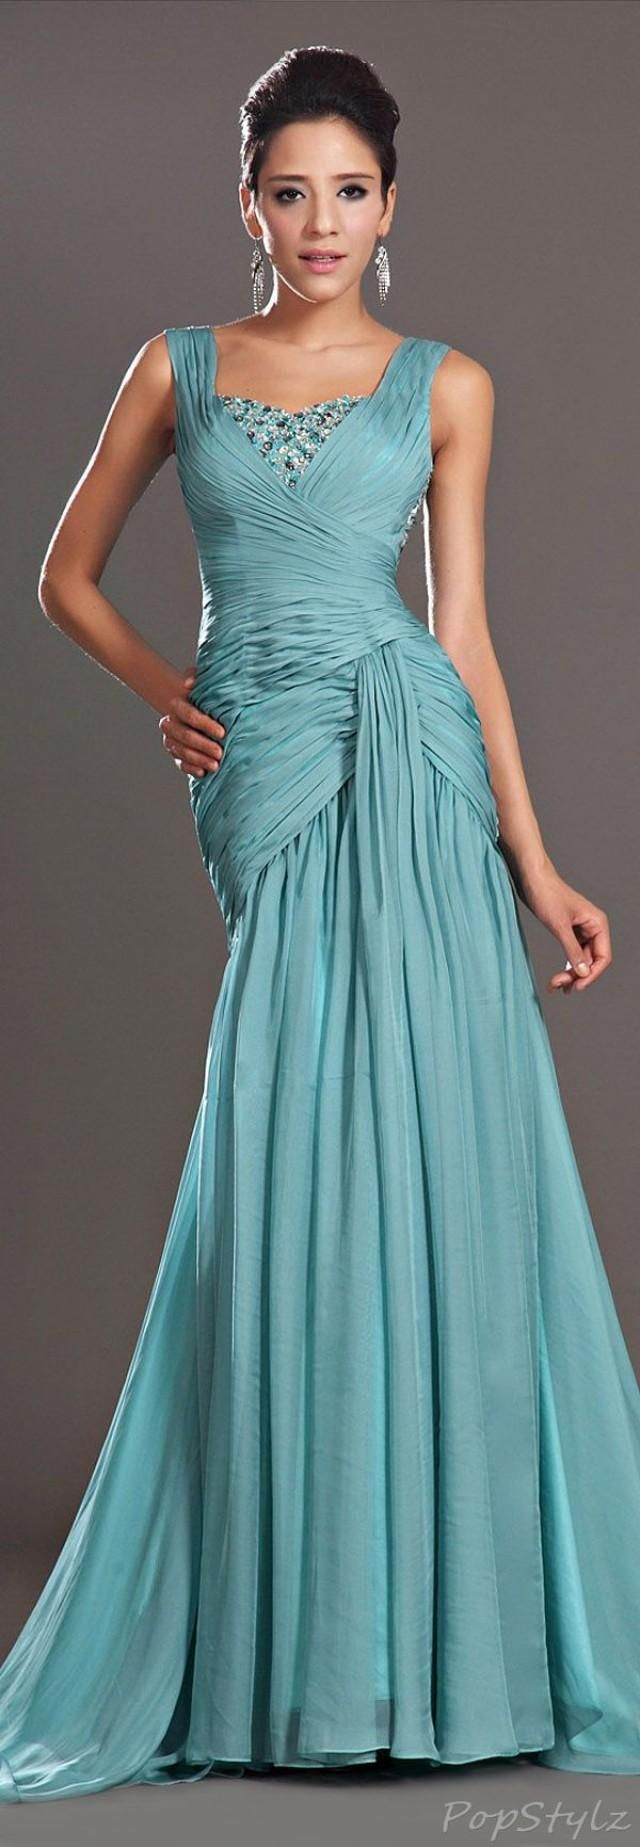 Fabulous Evening Dresses